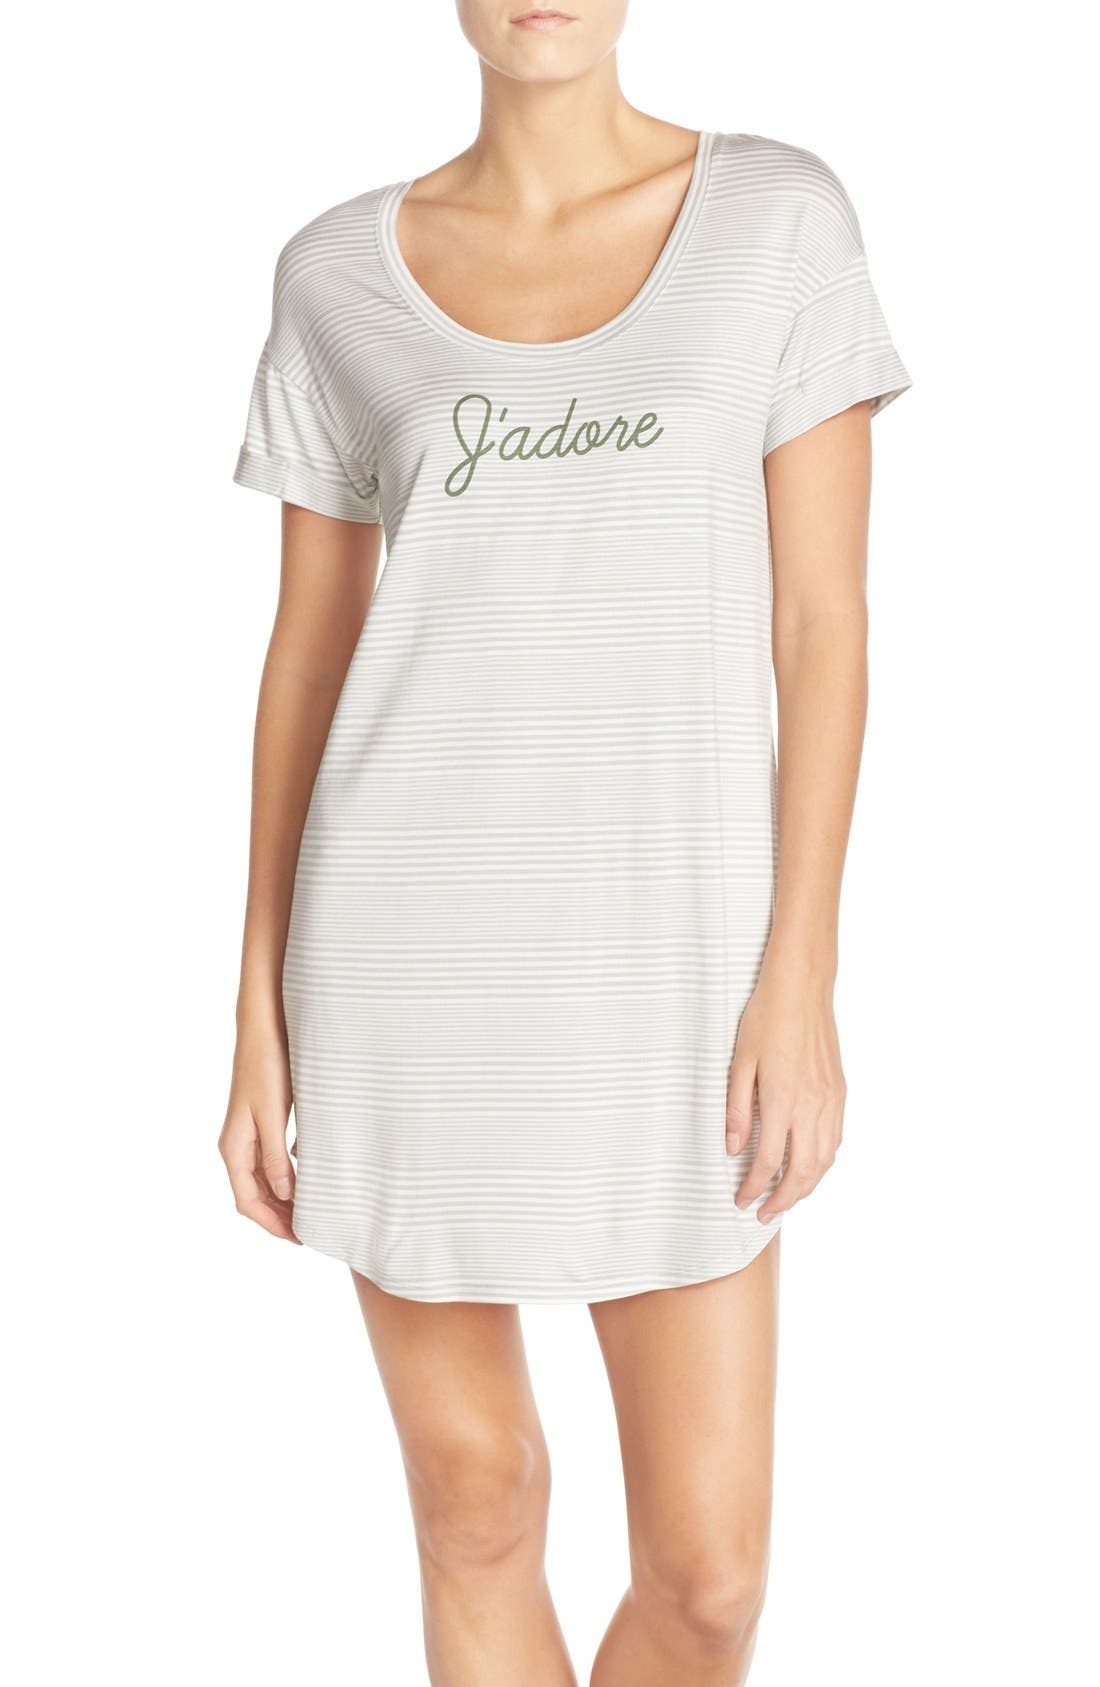 Alternate Image 1 Selected - Nordstrom Lingerie Graphic Jersey Sleep Shirt